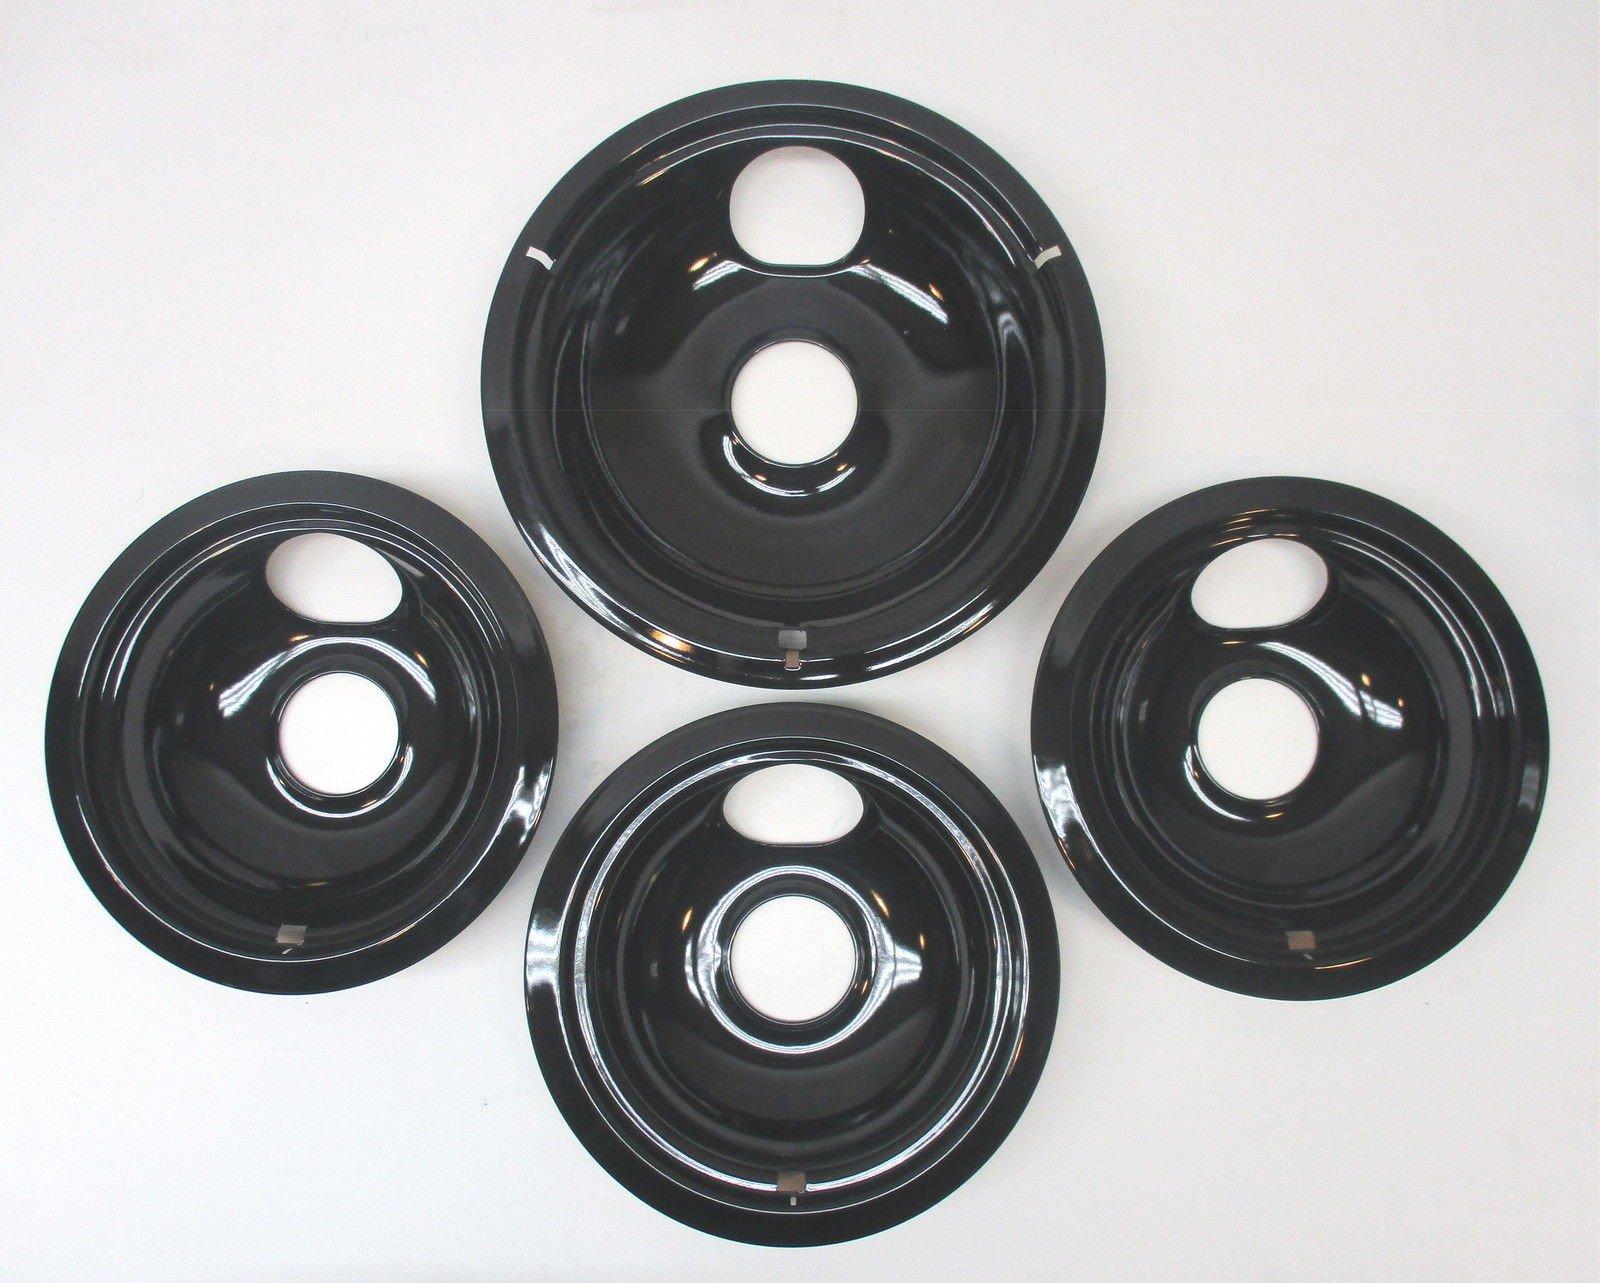 (O&HP) CB9 Range Stove Porcelain Drip Pans Bowls Set 3 and 1